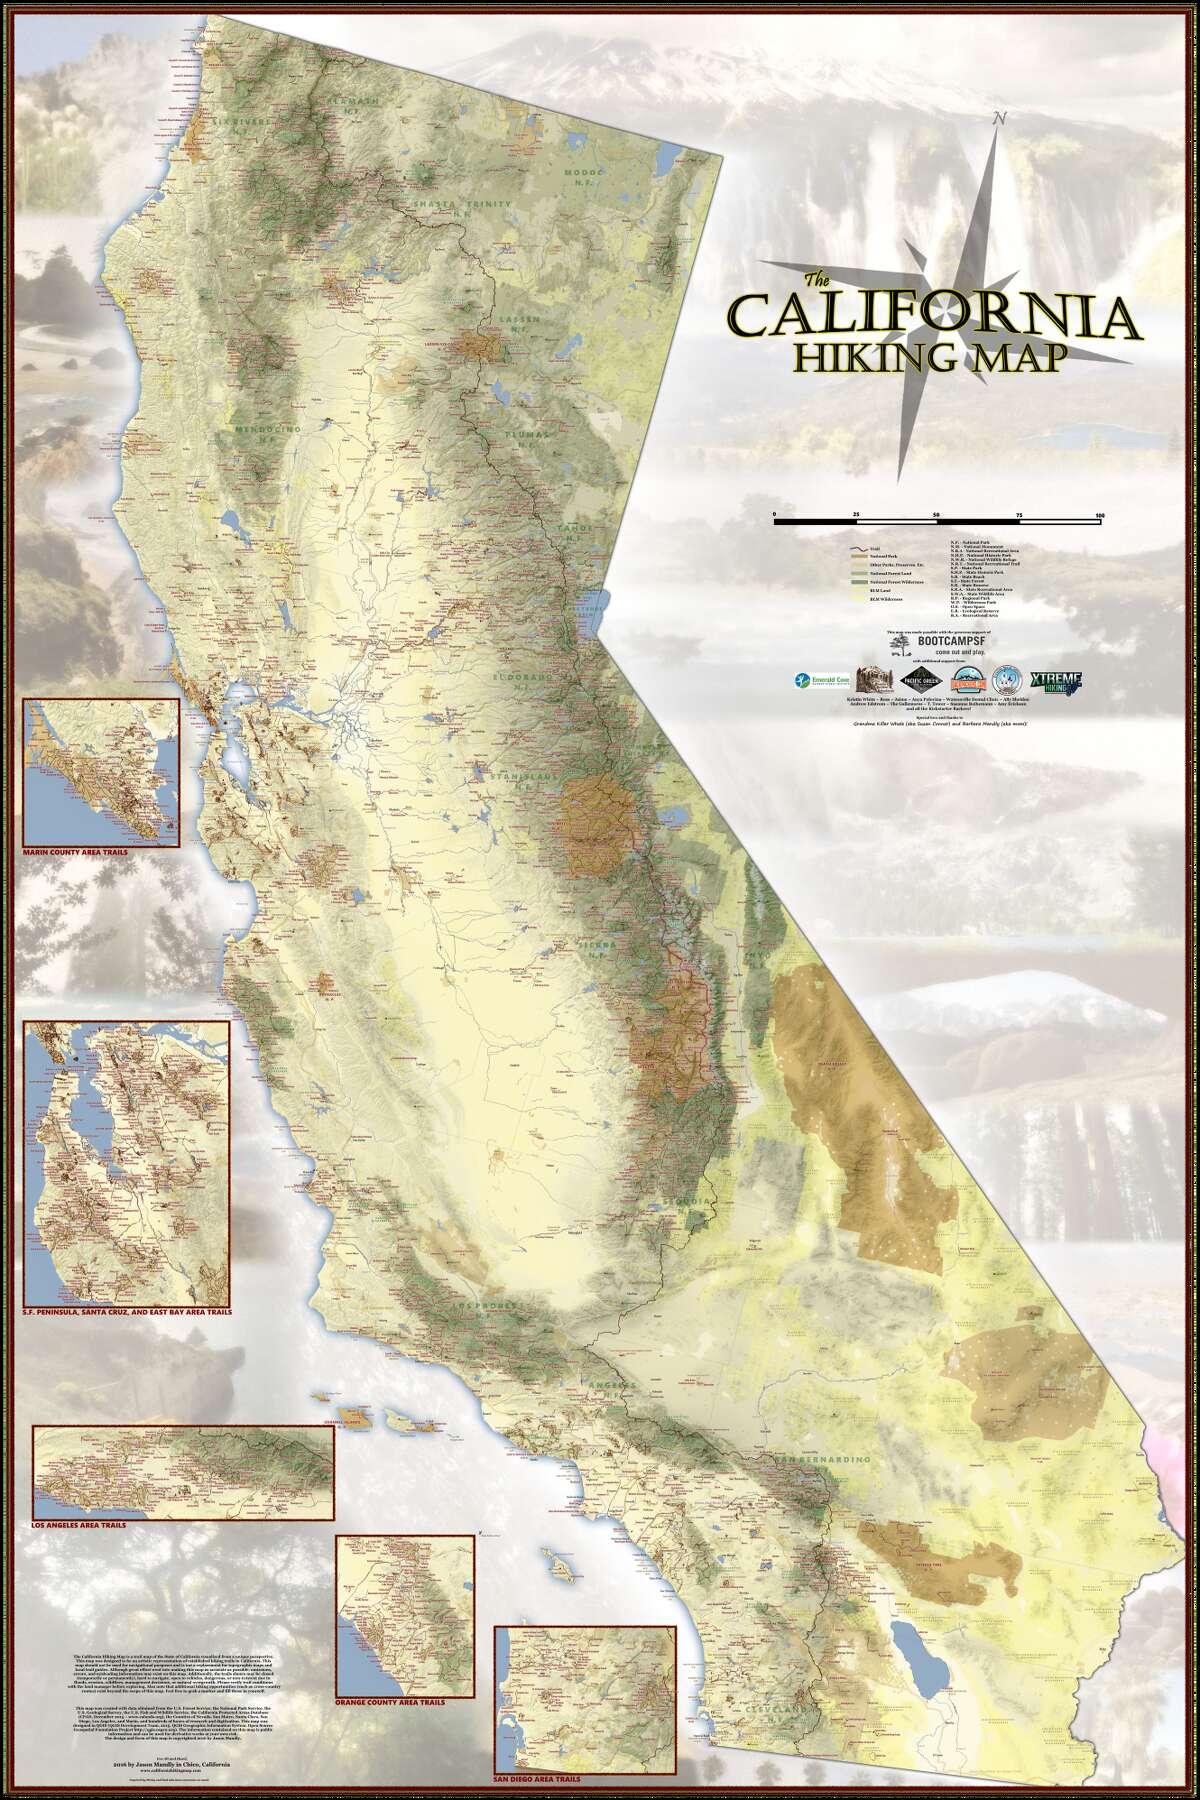 The full California Hiking Map.